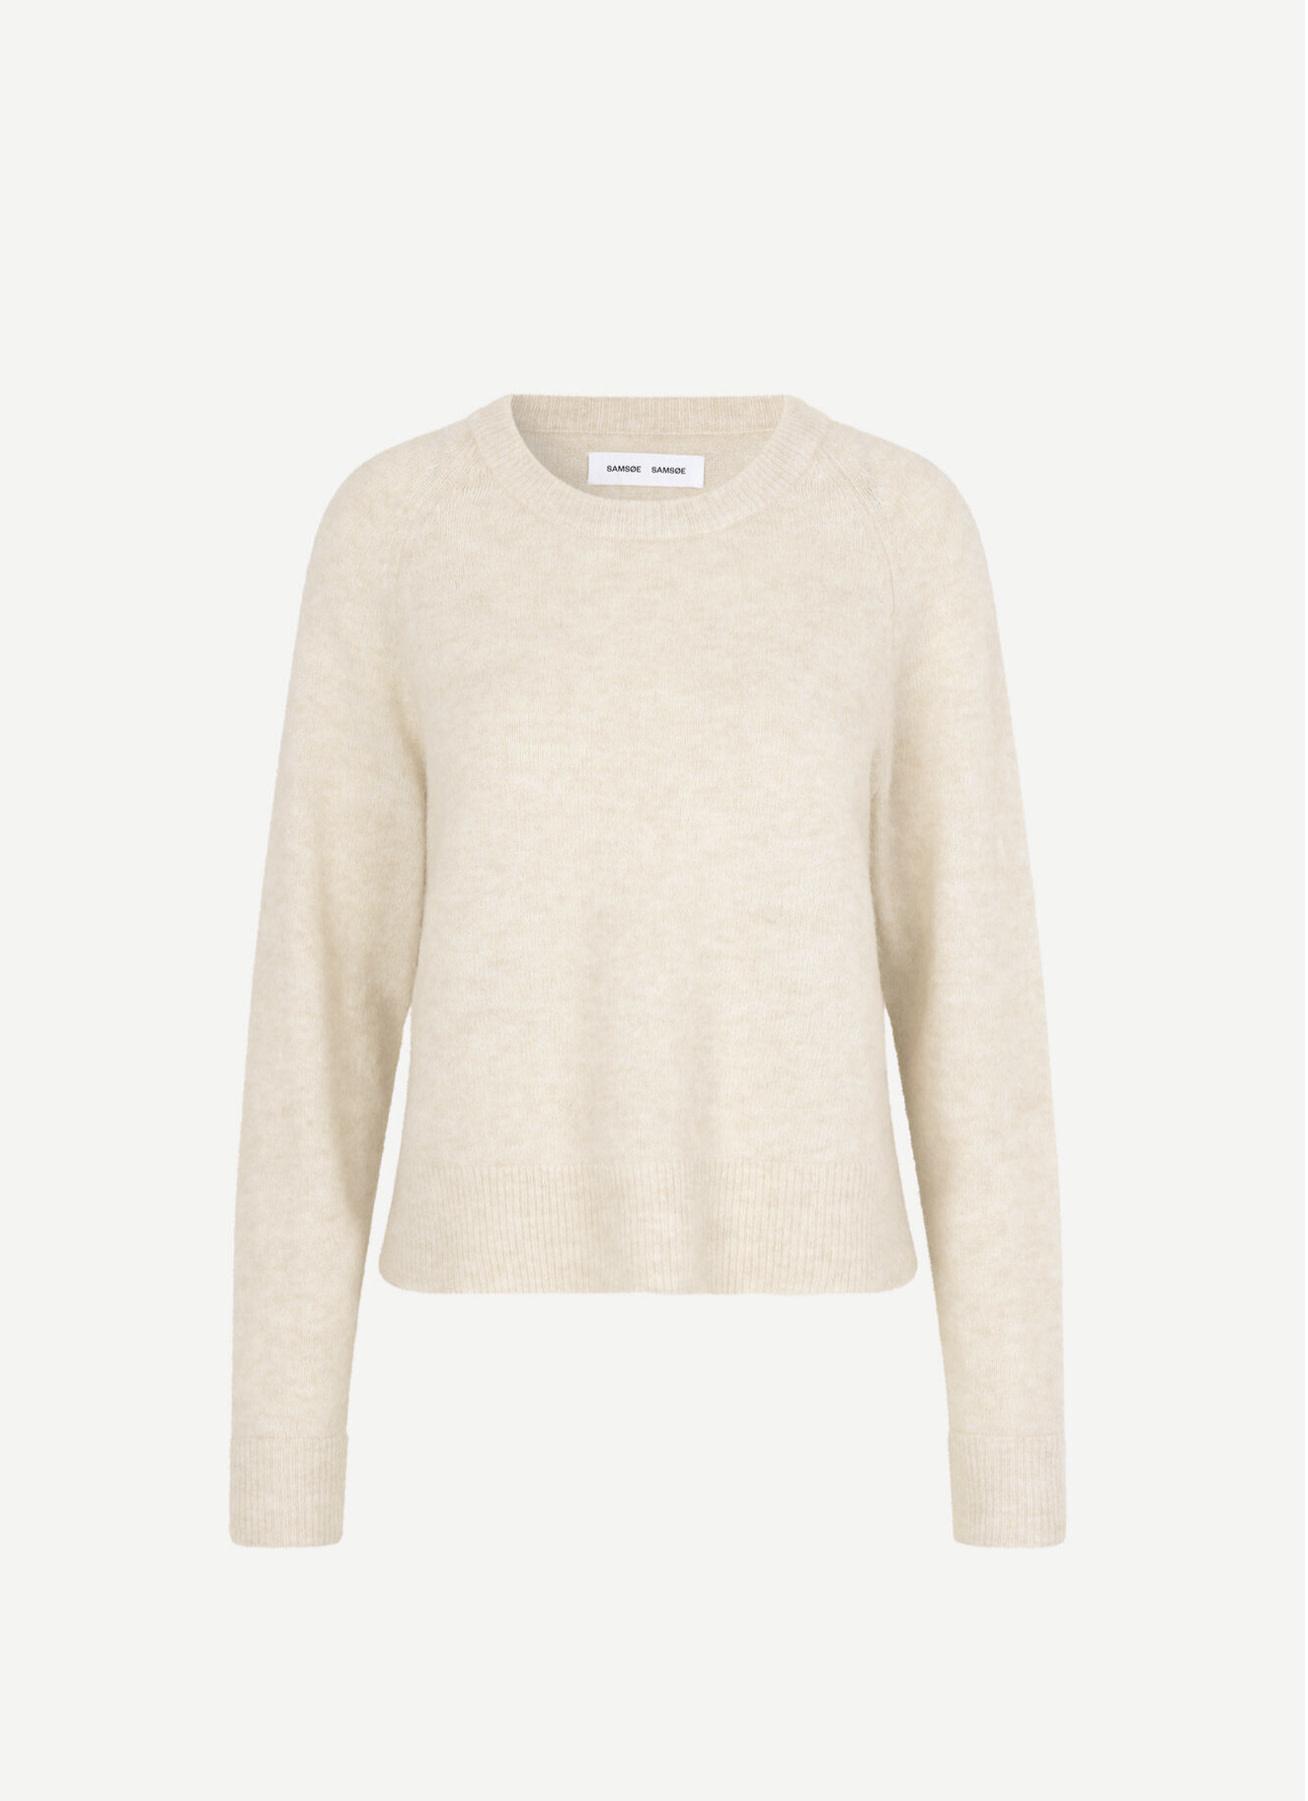 Nor O-N short sweater Samsoe Samsoe-1